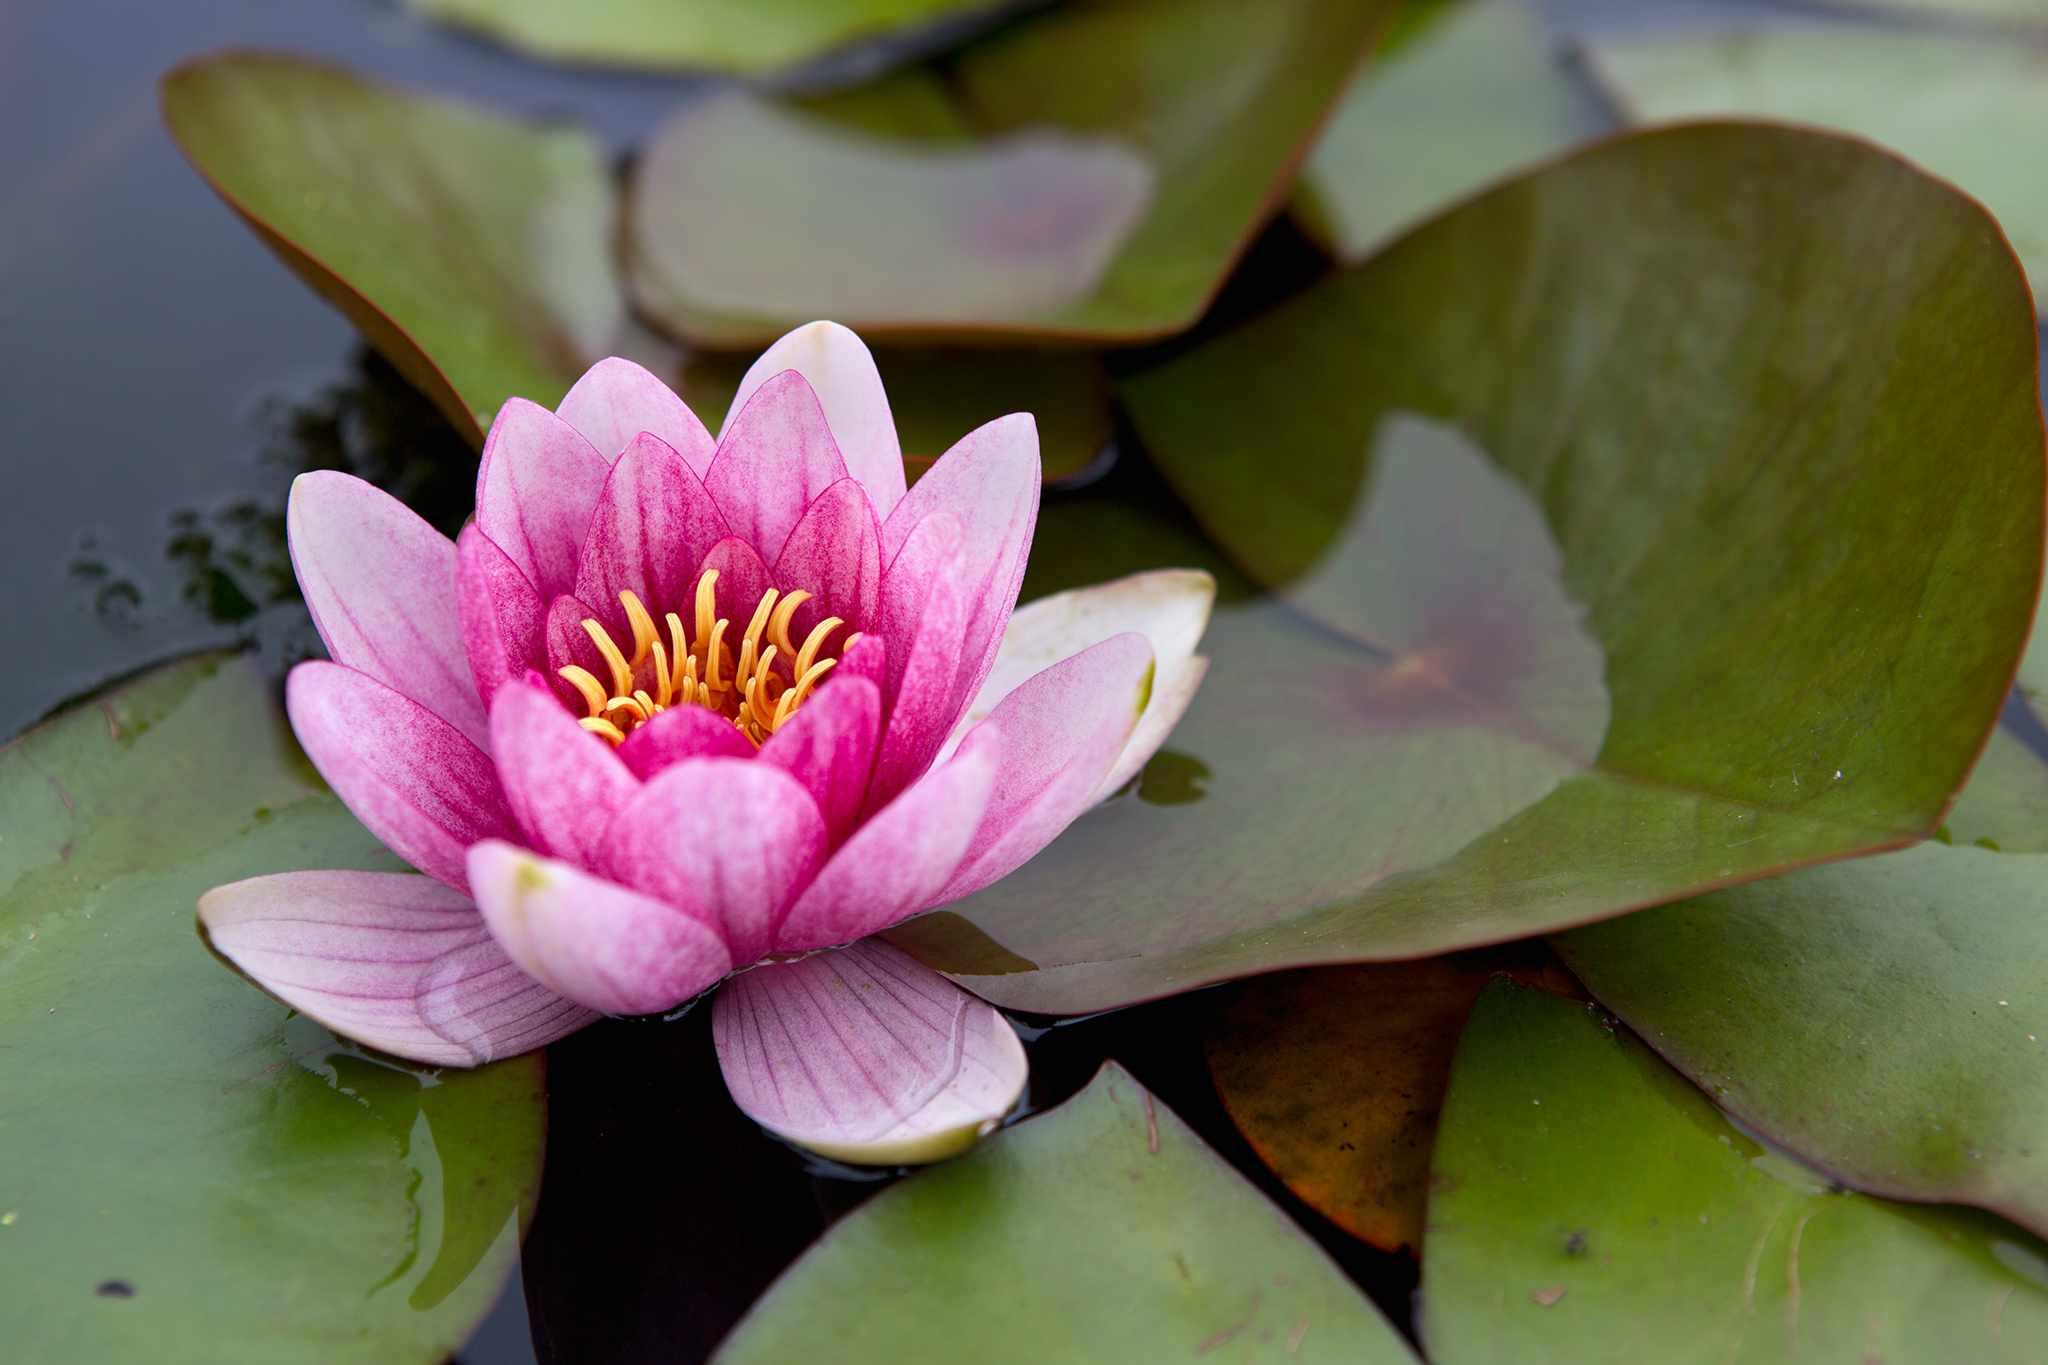 Tips on growing waterlilies (Nymphaea)